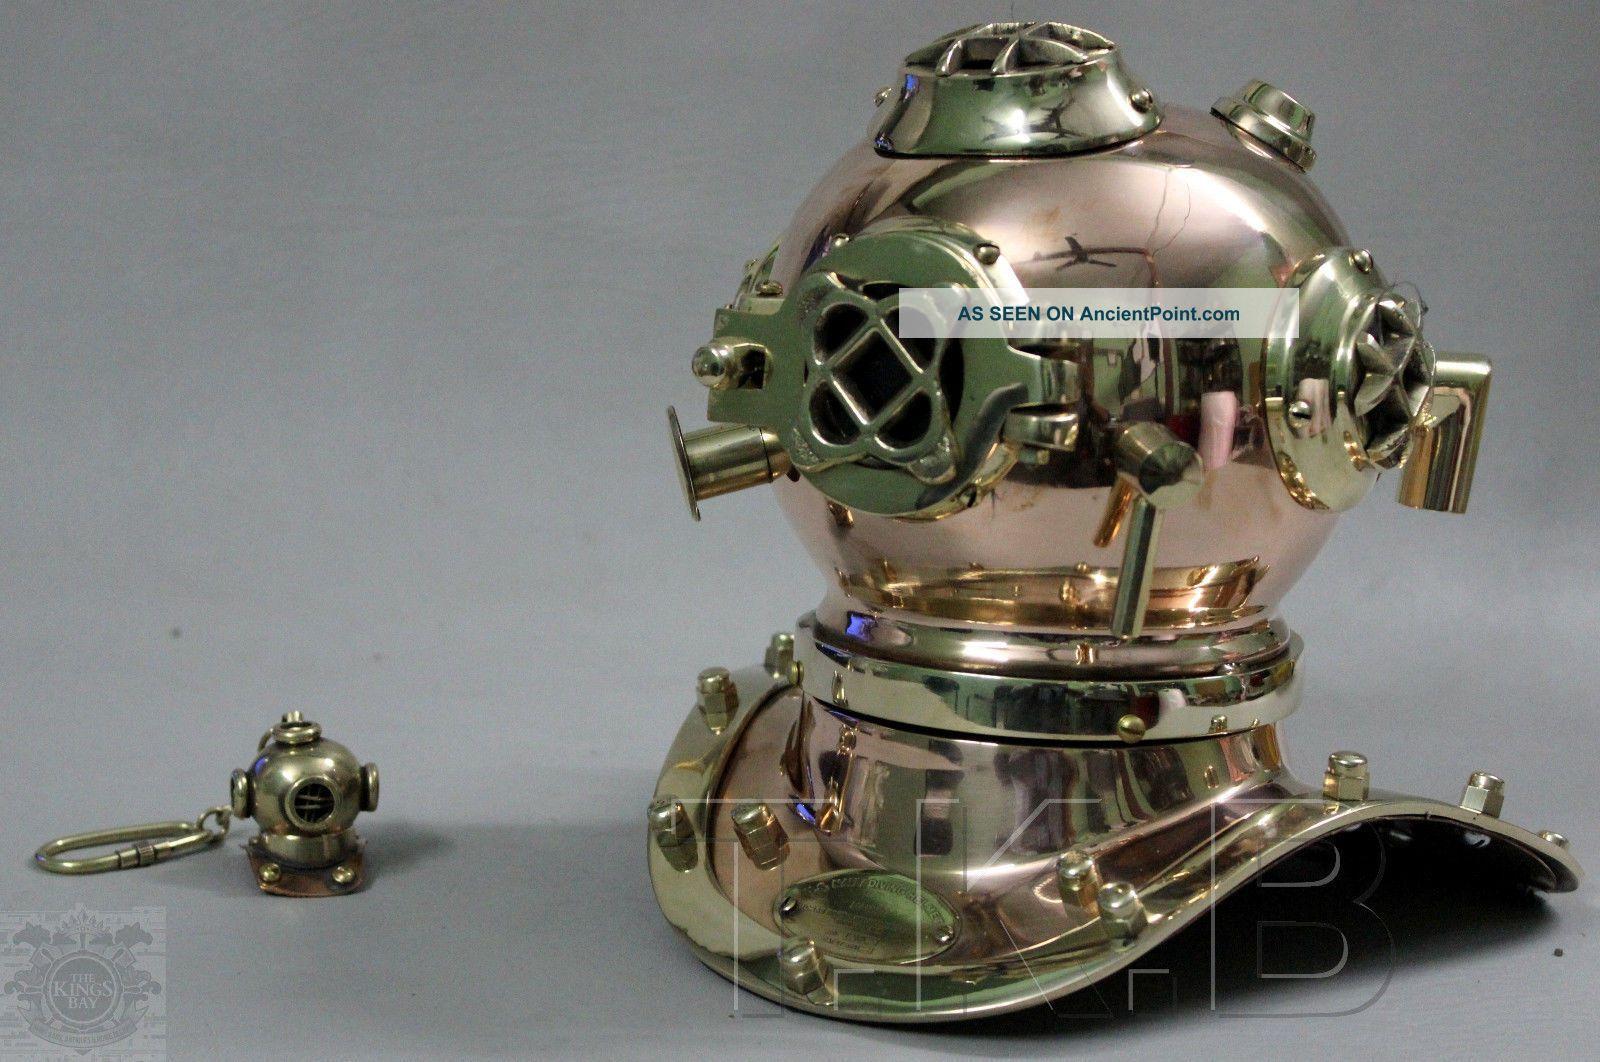 U.  S Navy Mark V Solid Copper & Brass Mini Diving Divers Helmet 6 Inch Diving Helmets photo